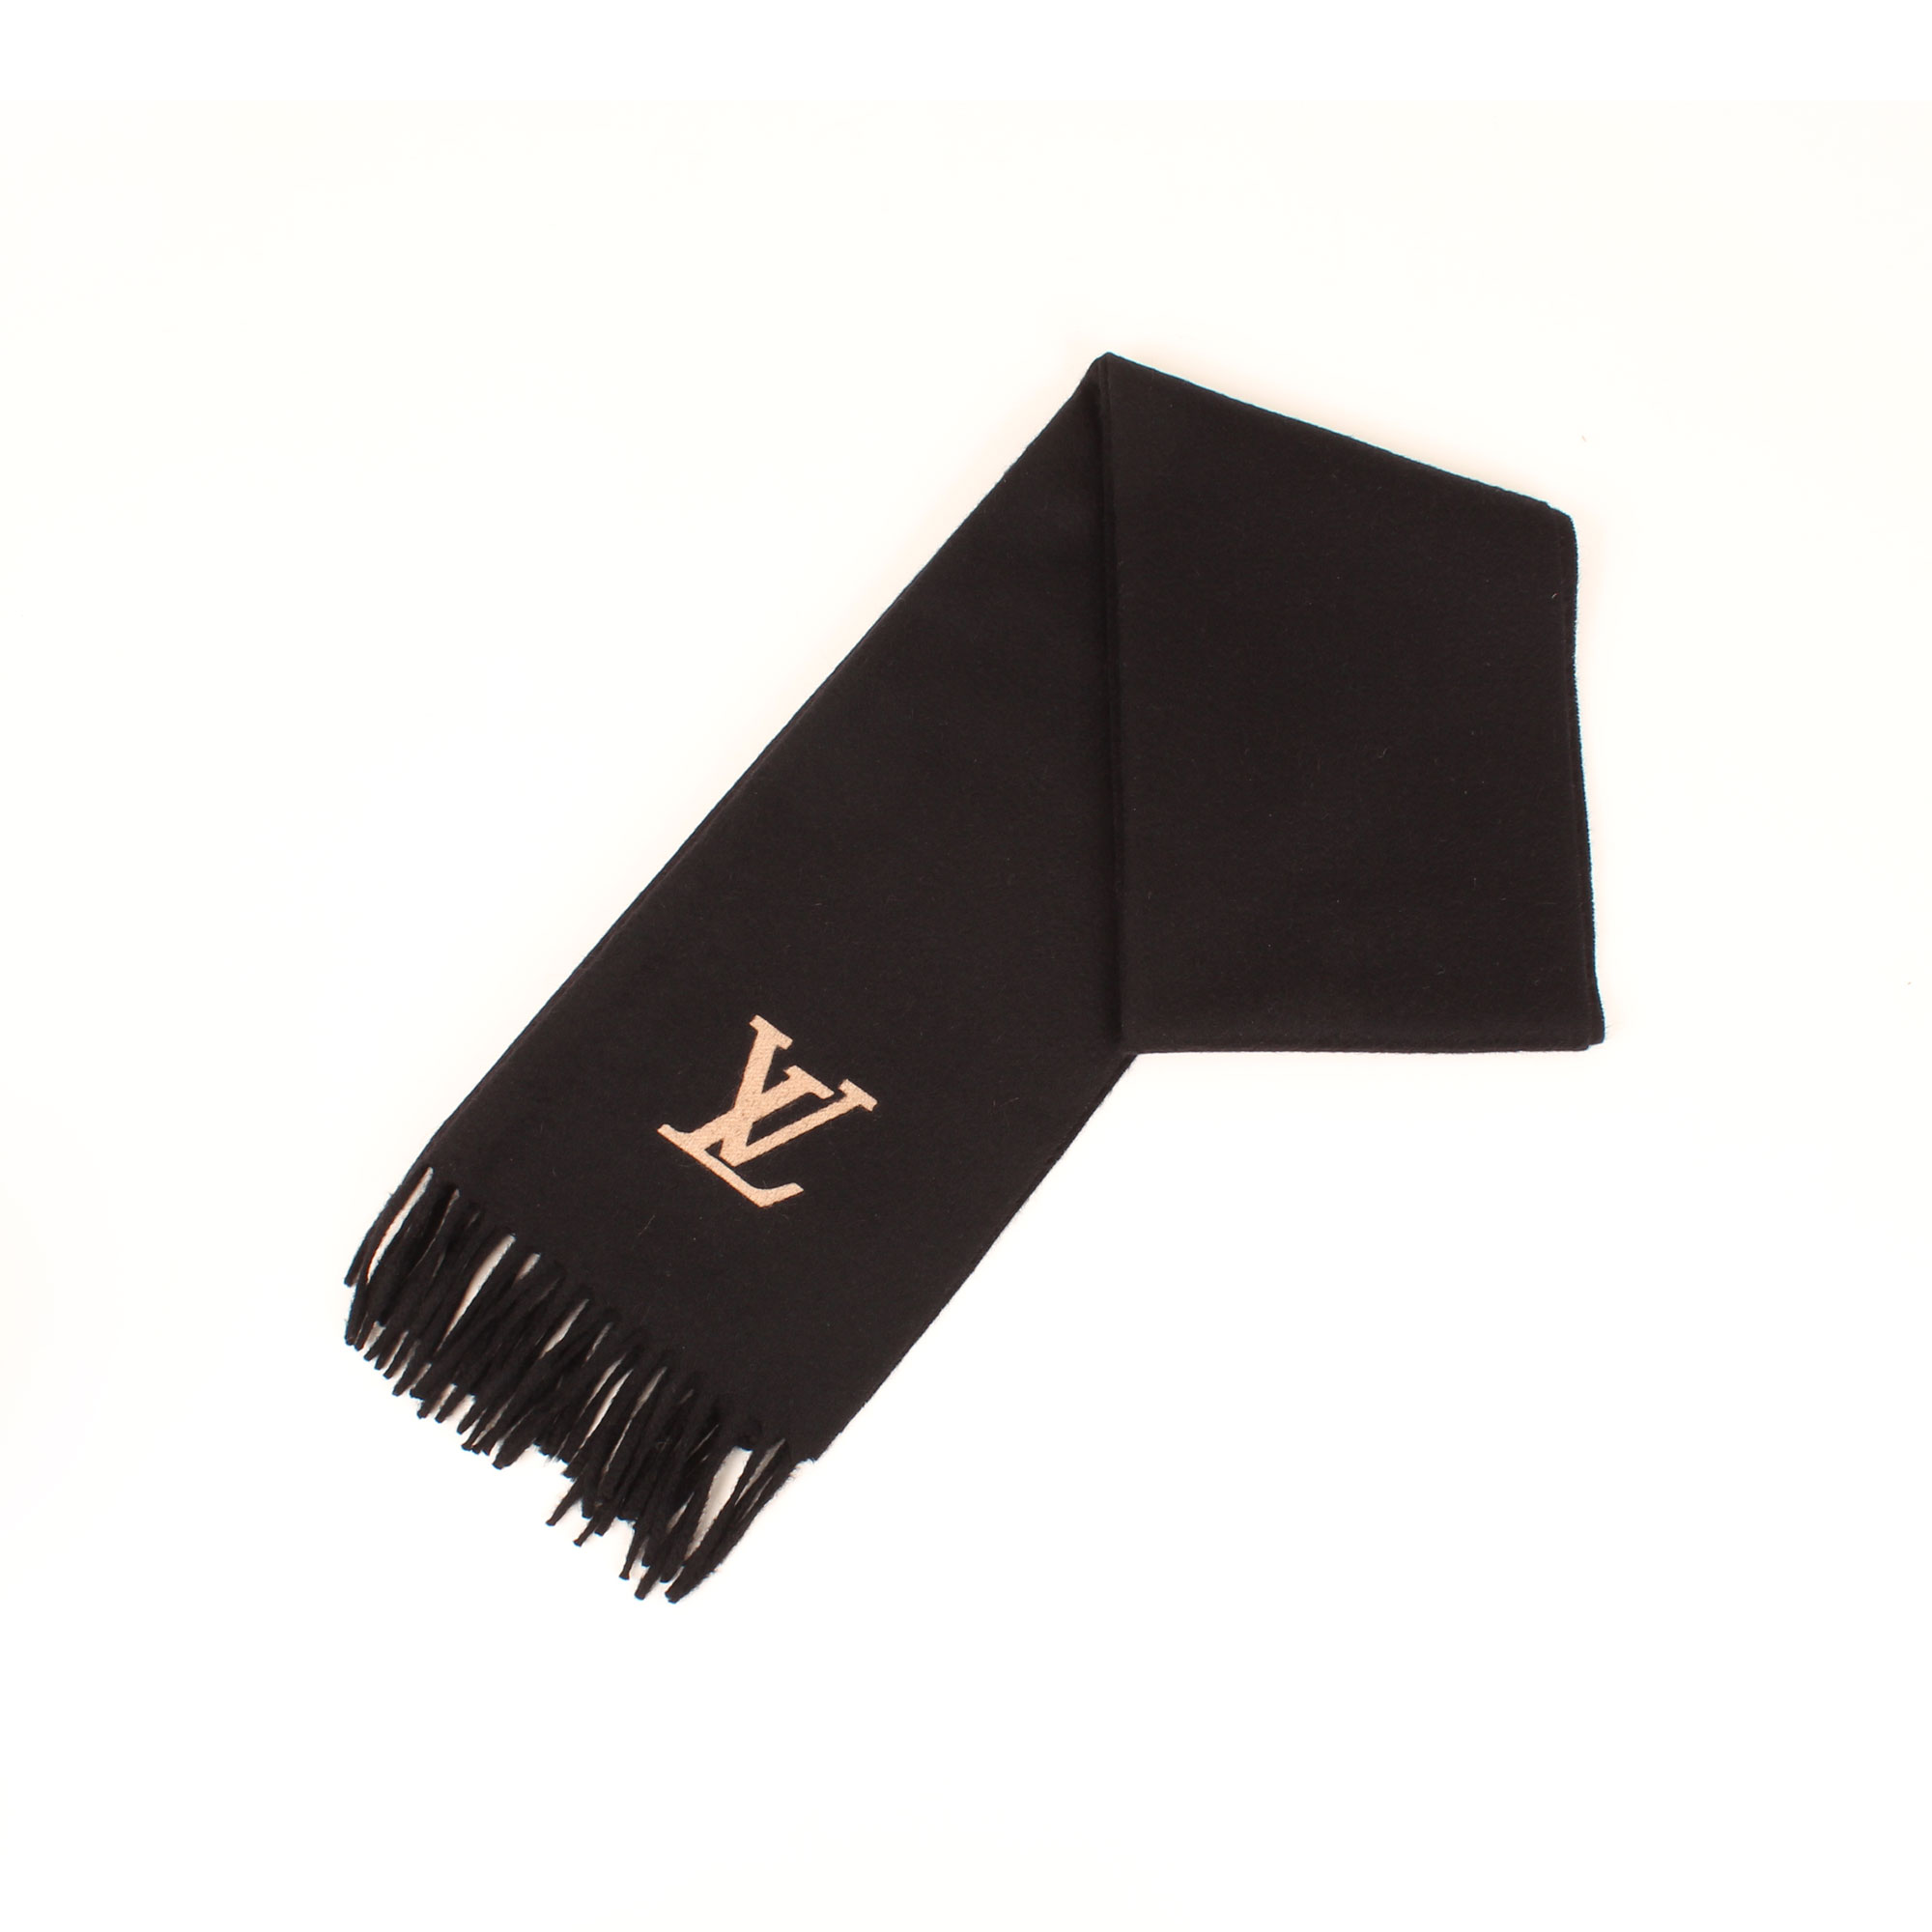 scarf-louis-vuitton-jehlam-cashmere-black-general-2